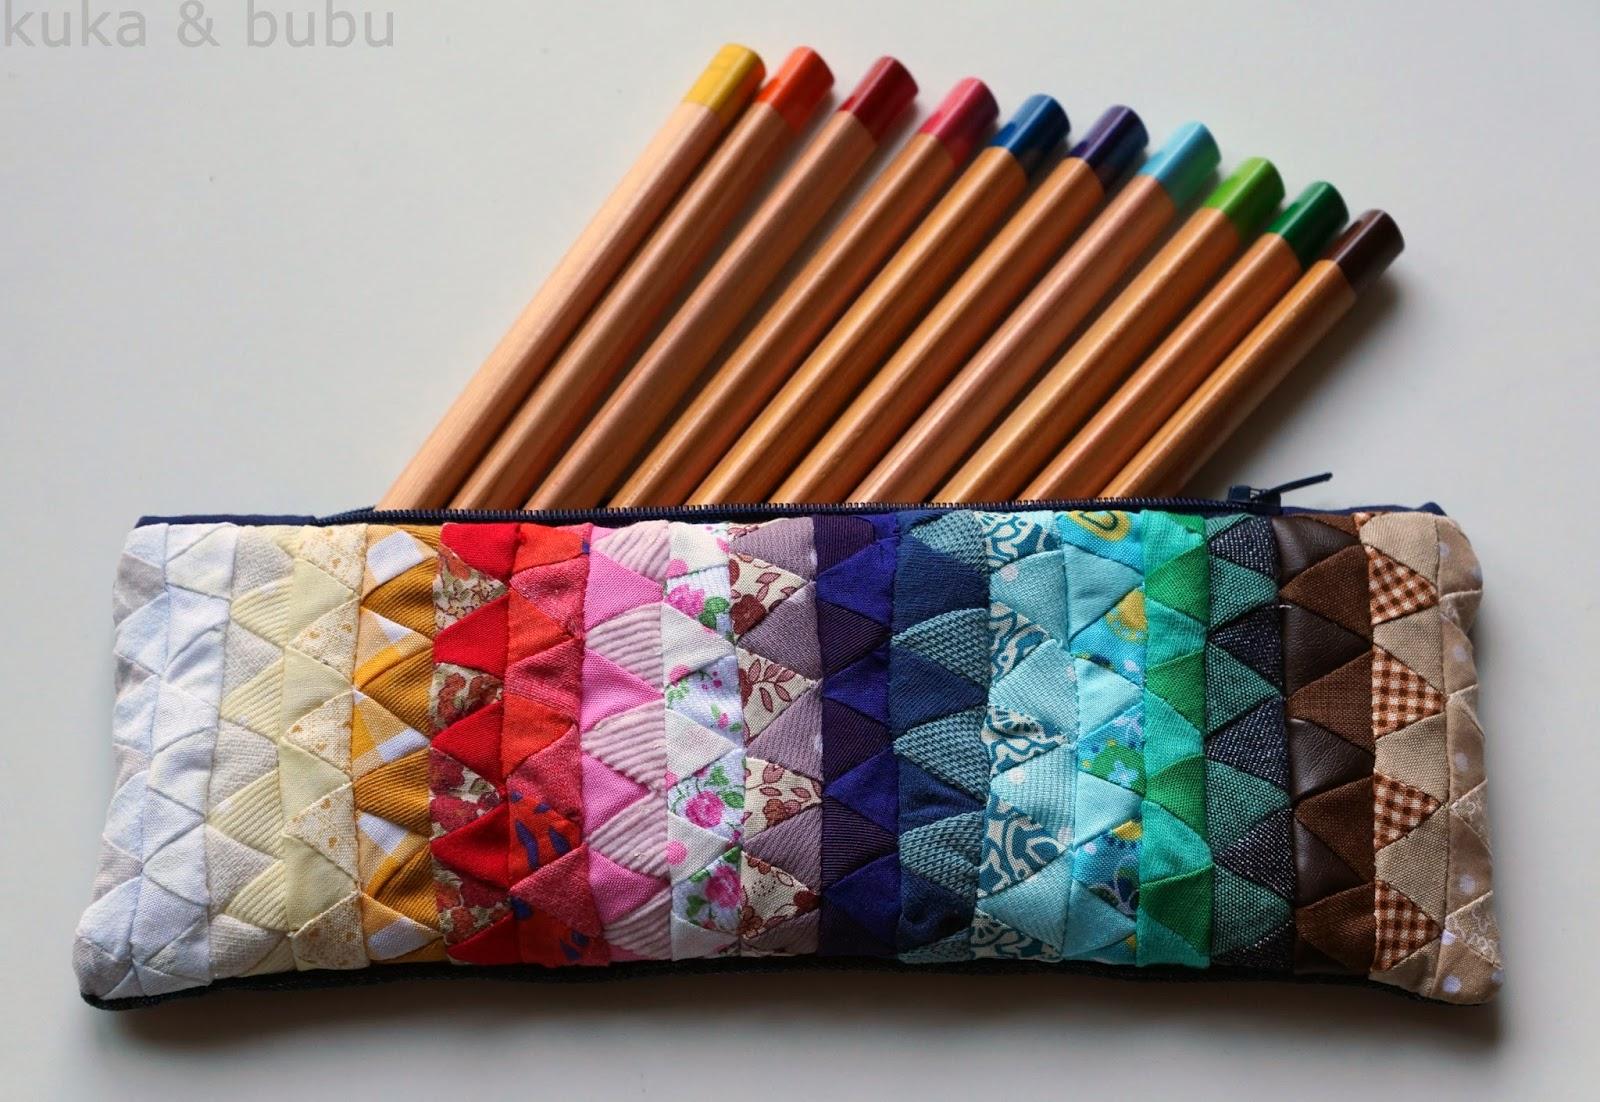 http://kukaandbubu.blogspot.com.es/2014/07/patchwork-pencil-case-estuche-base-de.html